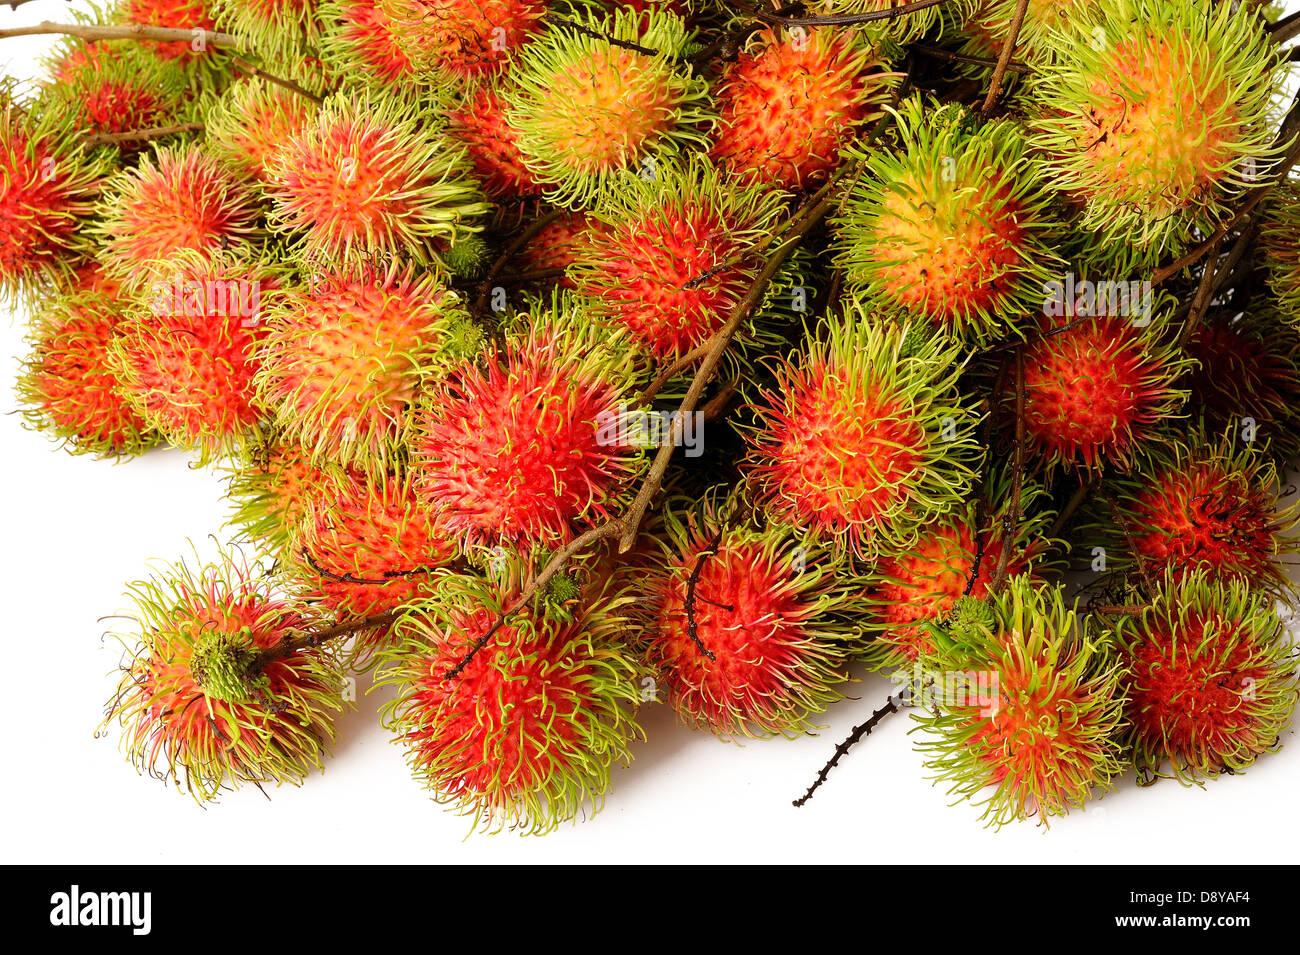 Rambután frutas sobre fondo blanco. Imagen De Stock